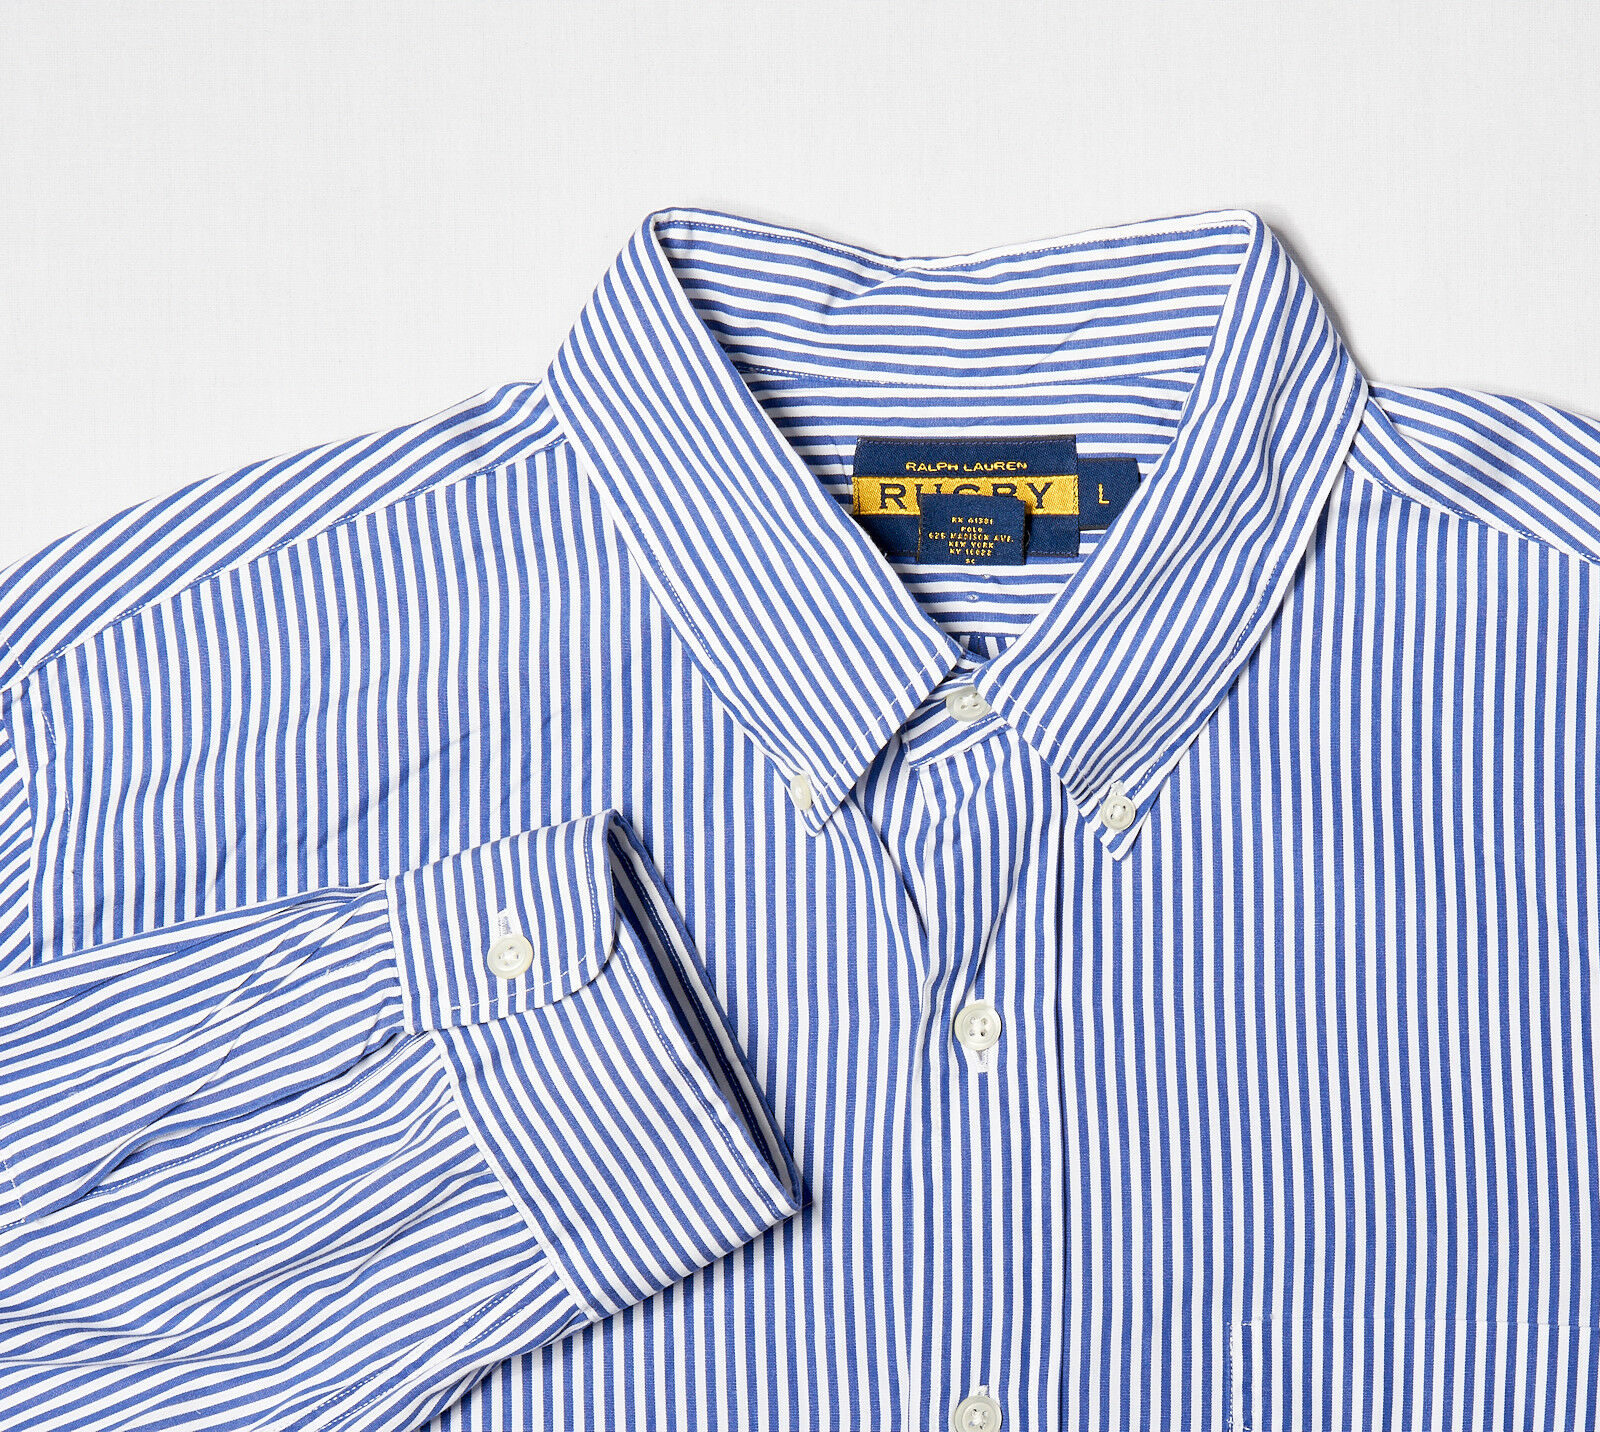 Mens RUGBY RALPH LAUREN Button-Down Shirt L, Lake bluee University Striped Cotton